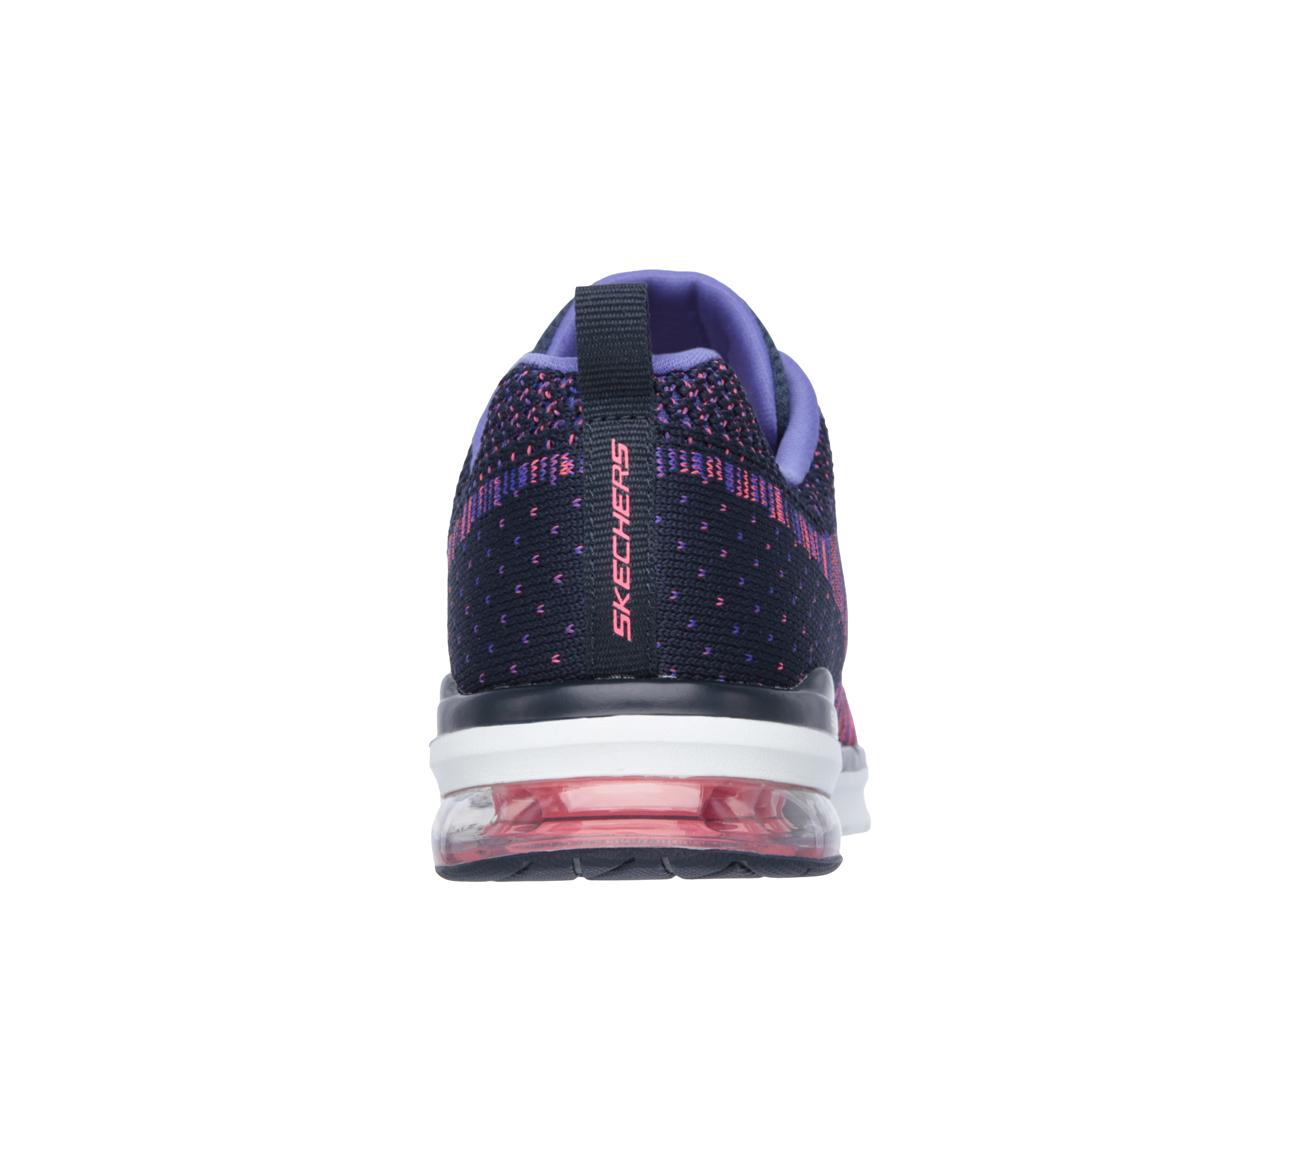 2895e79d7cb6 SKECHERS Running Shoes SKECH-AIR INFINITY-WLIDCARD Pink Purple Women ...